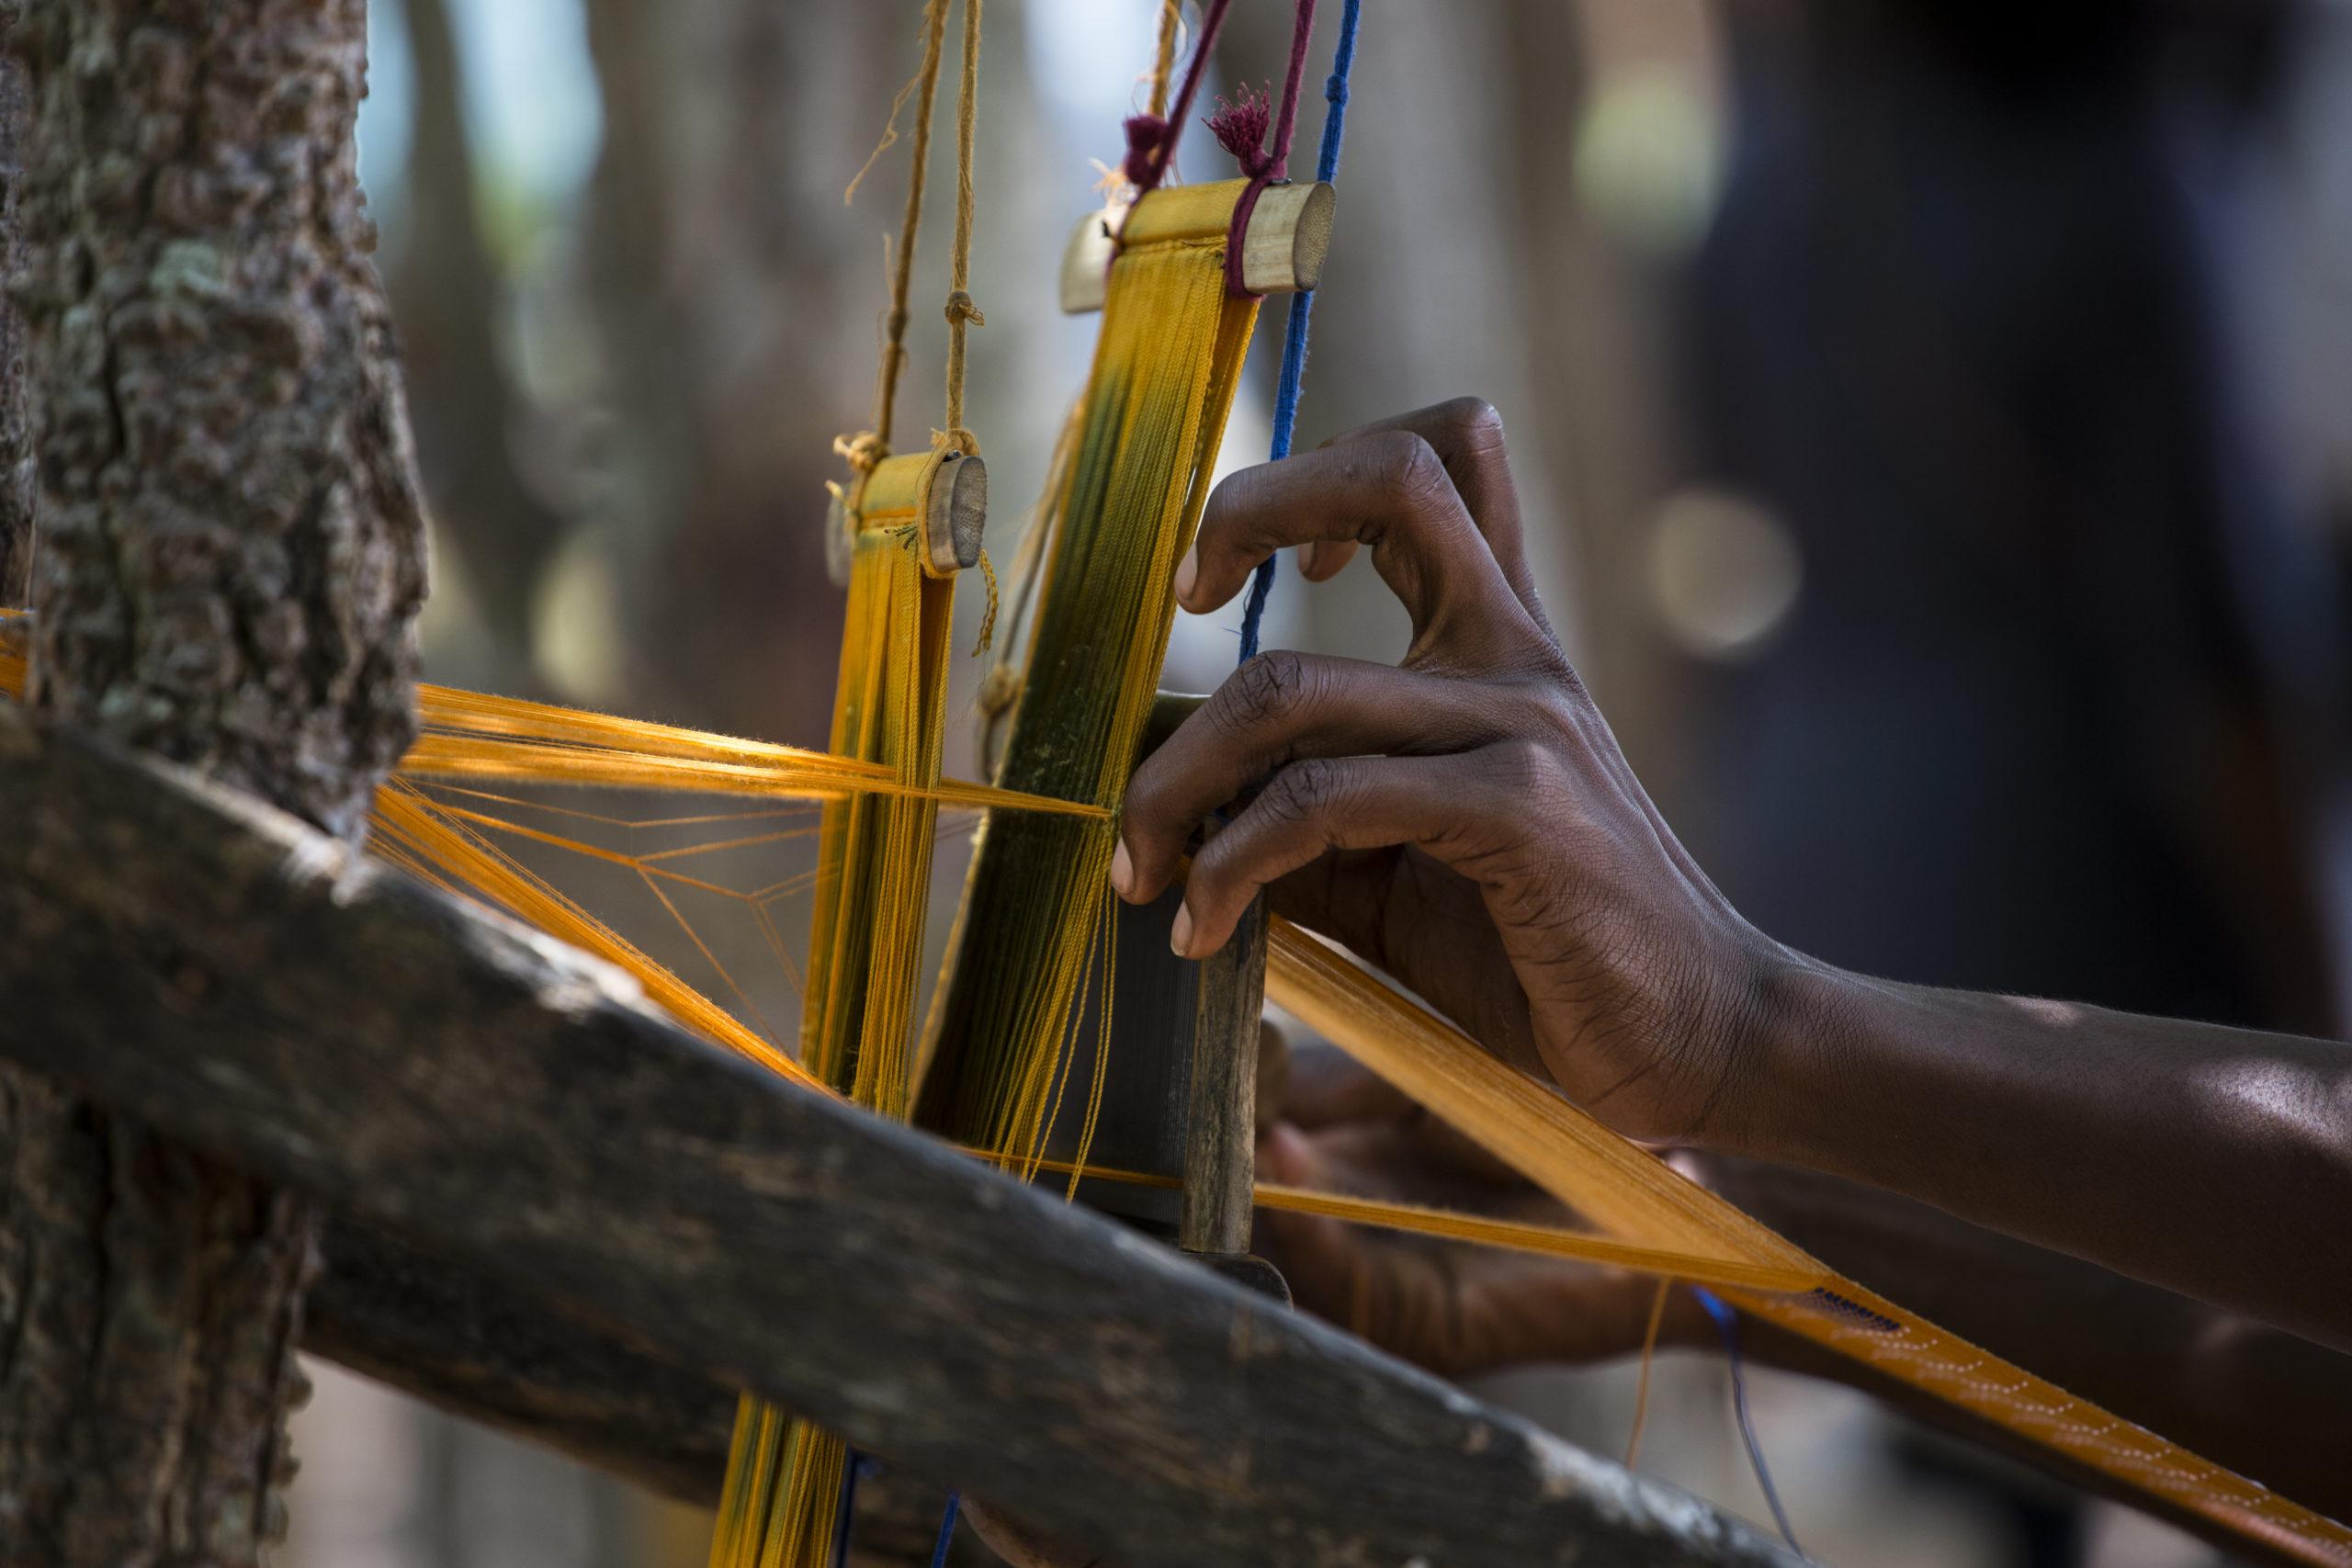 Ikat weaving in EFI partner Artisan Cooperative in Côte d'Ivoire. © Magic Studios